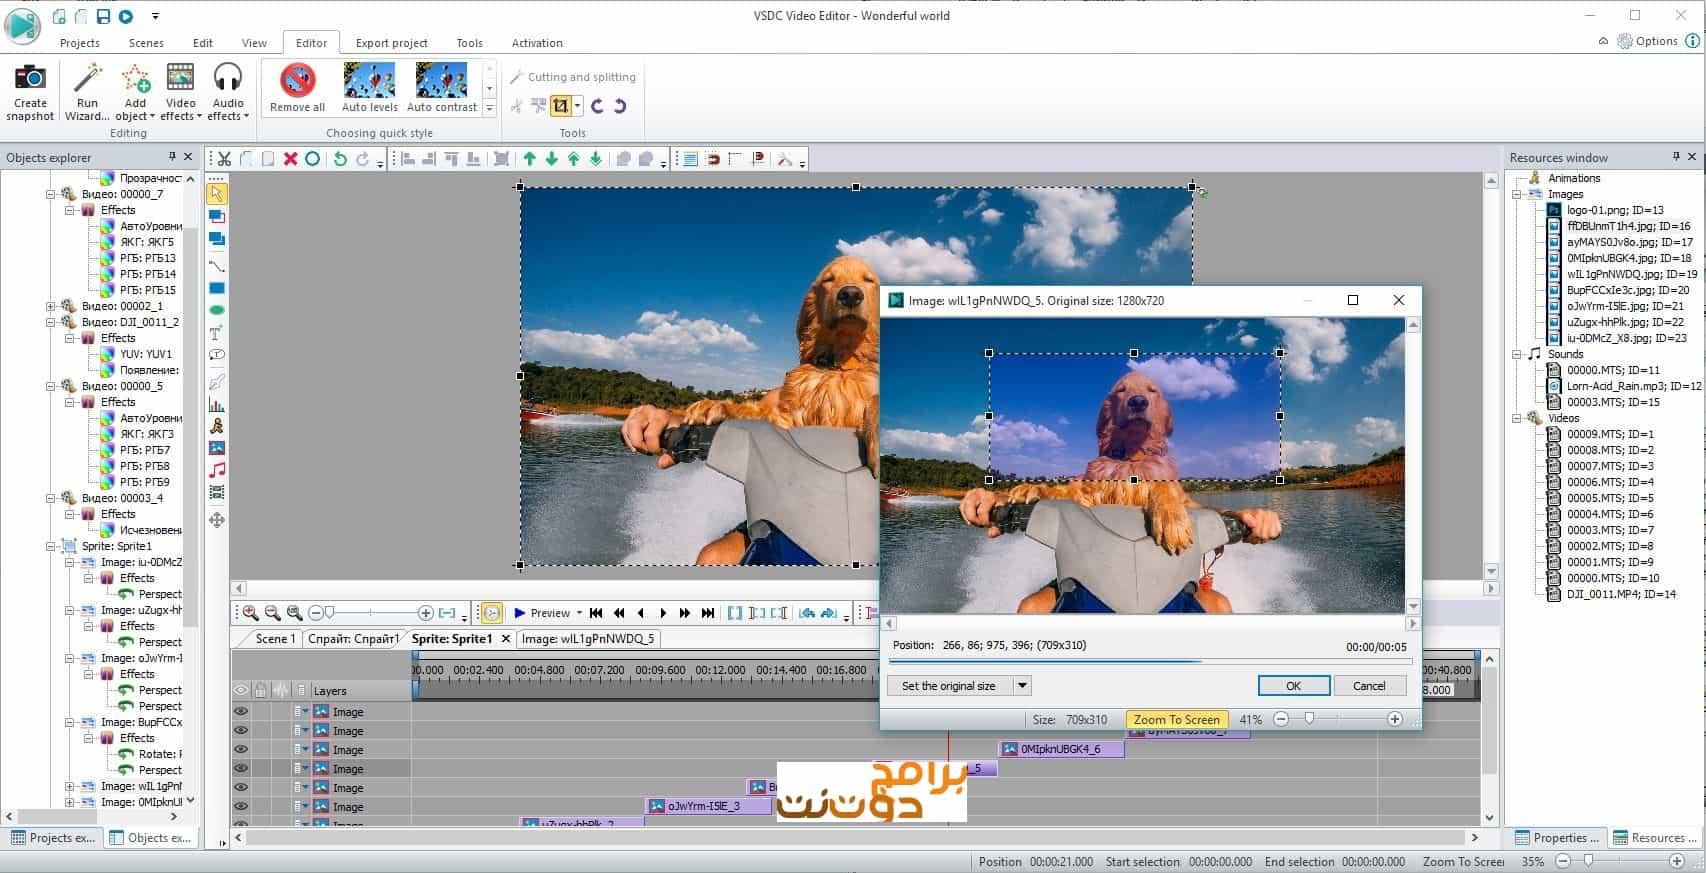 معلومات عن برنامج VSDC Free Video Editor :